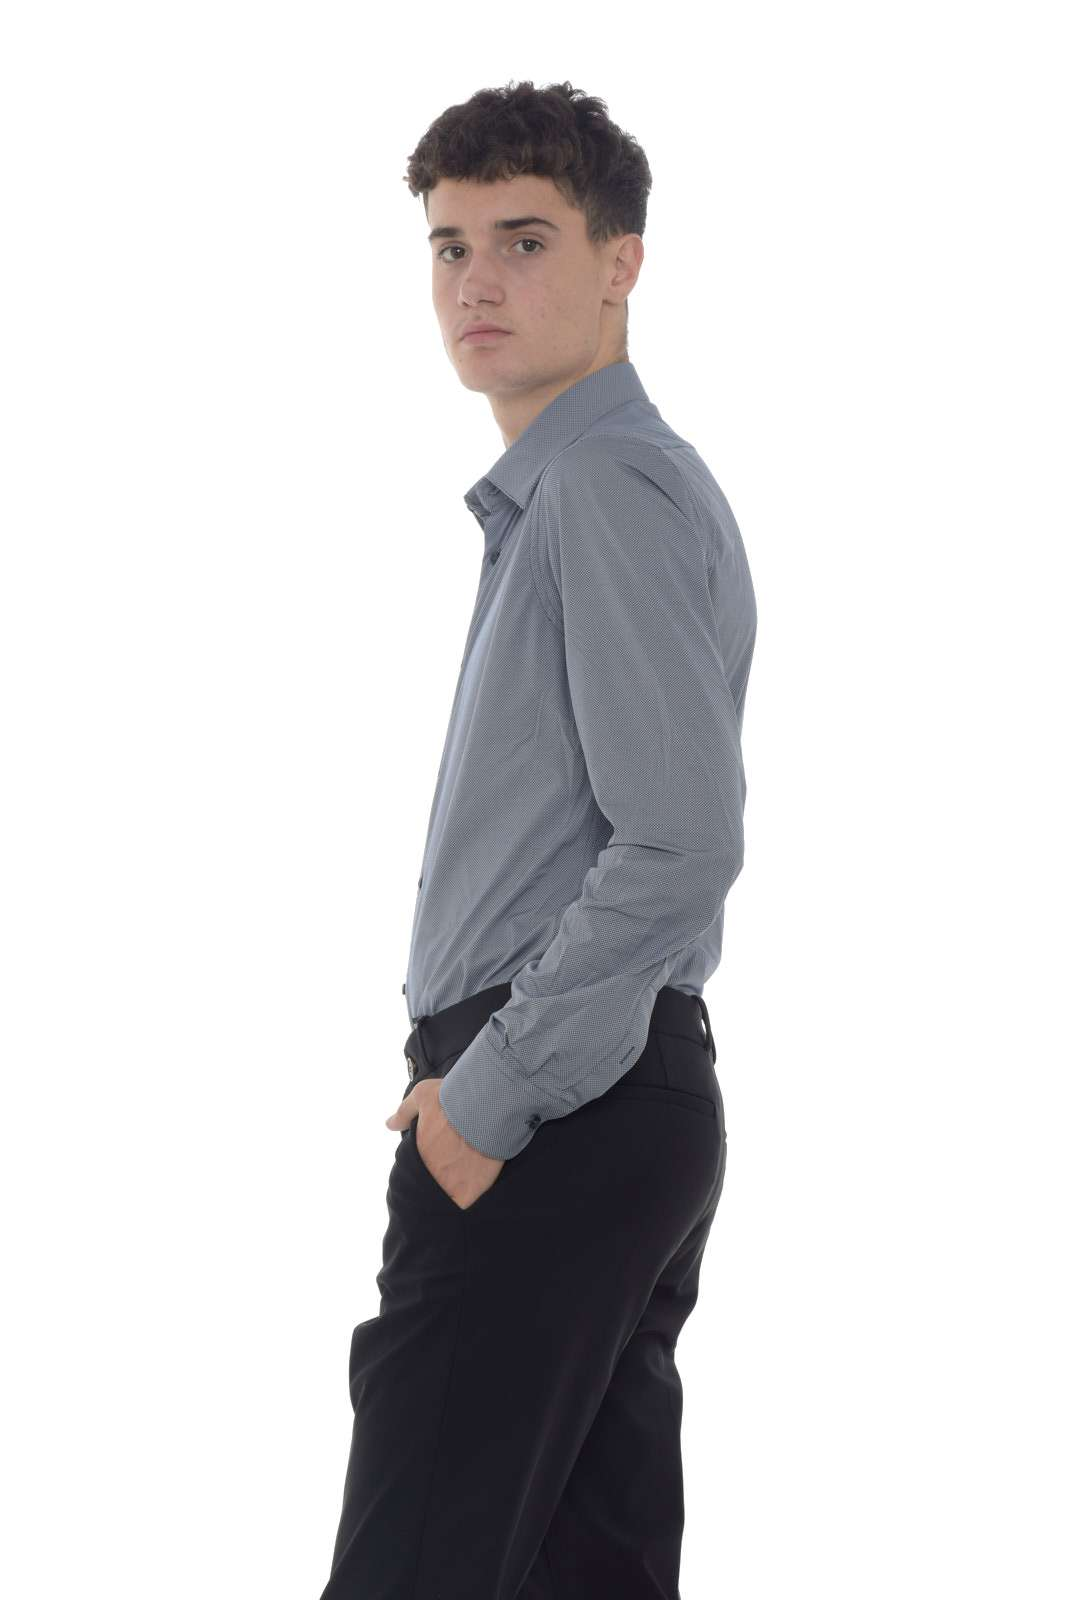 https://www.parmax.com/media/catalog/product/a/i/AI-outlet_parmax-camicia-uomo-RRD-W19255-B.jpg